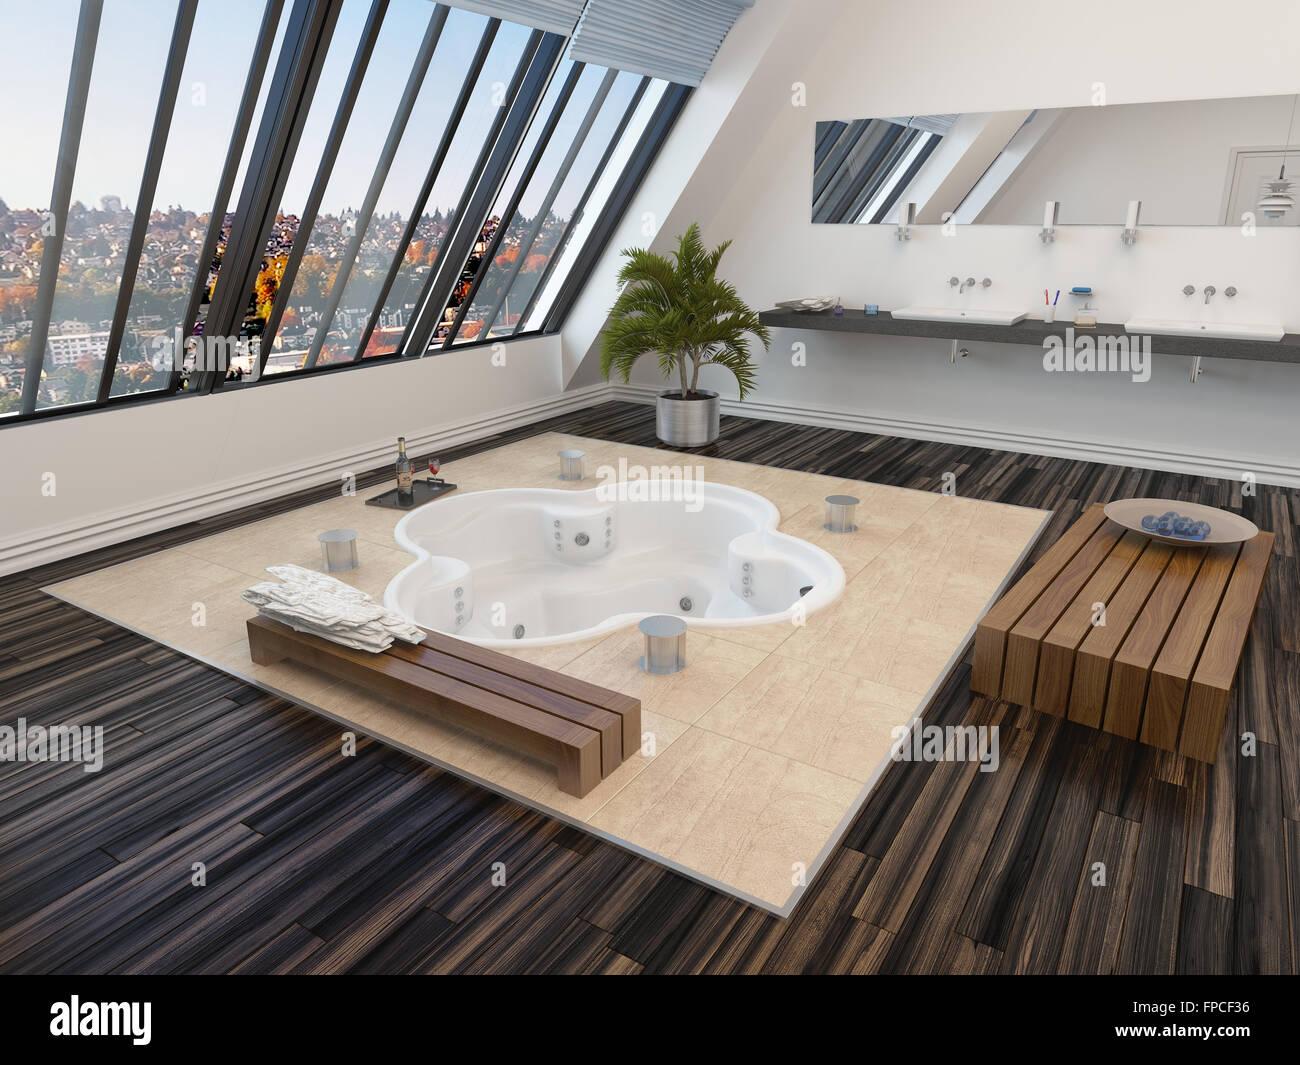 Modern bathroom interior with a sunken spa bath in a parquet floor